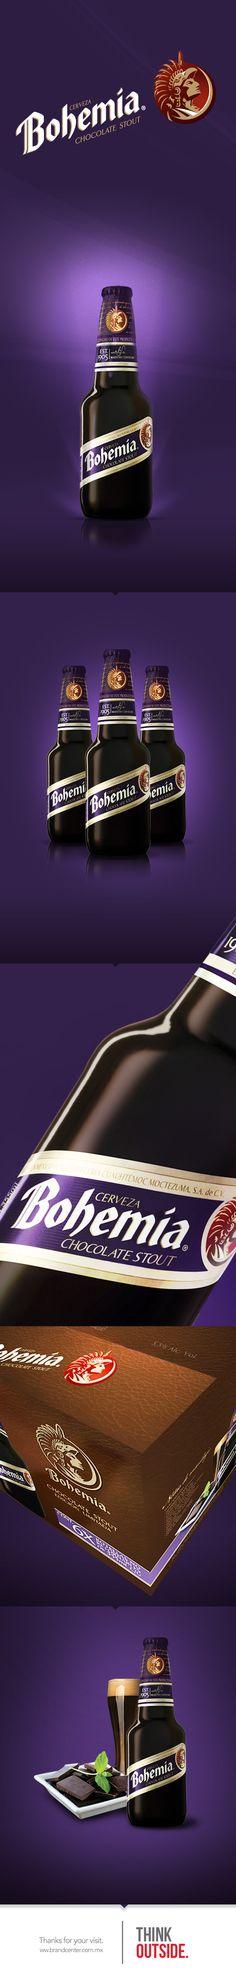 Bohemia Chocolate Stout by Brand Center , via Behance